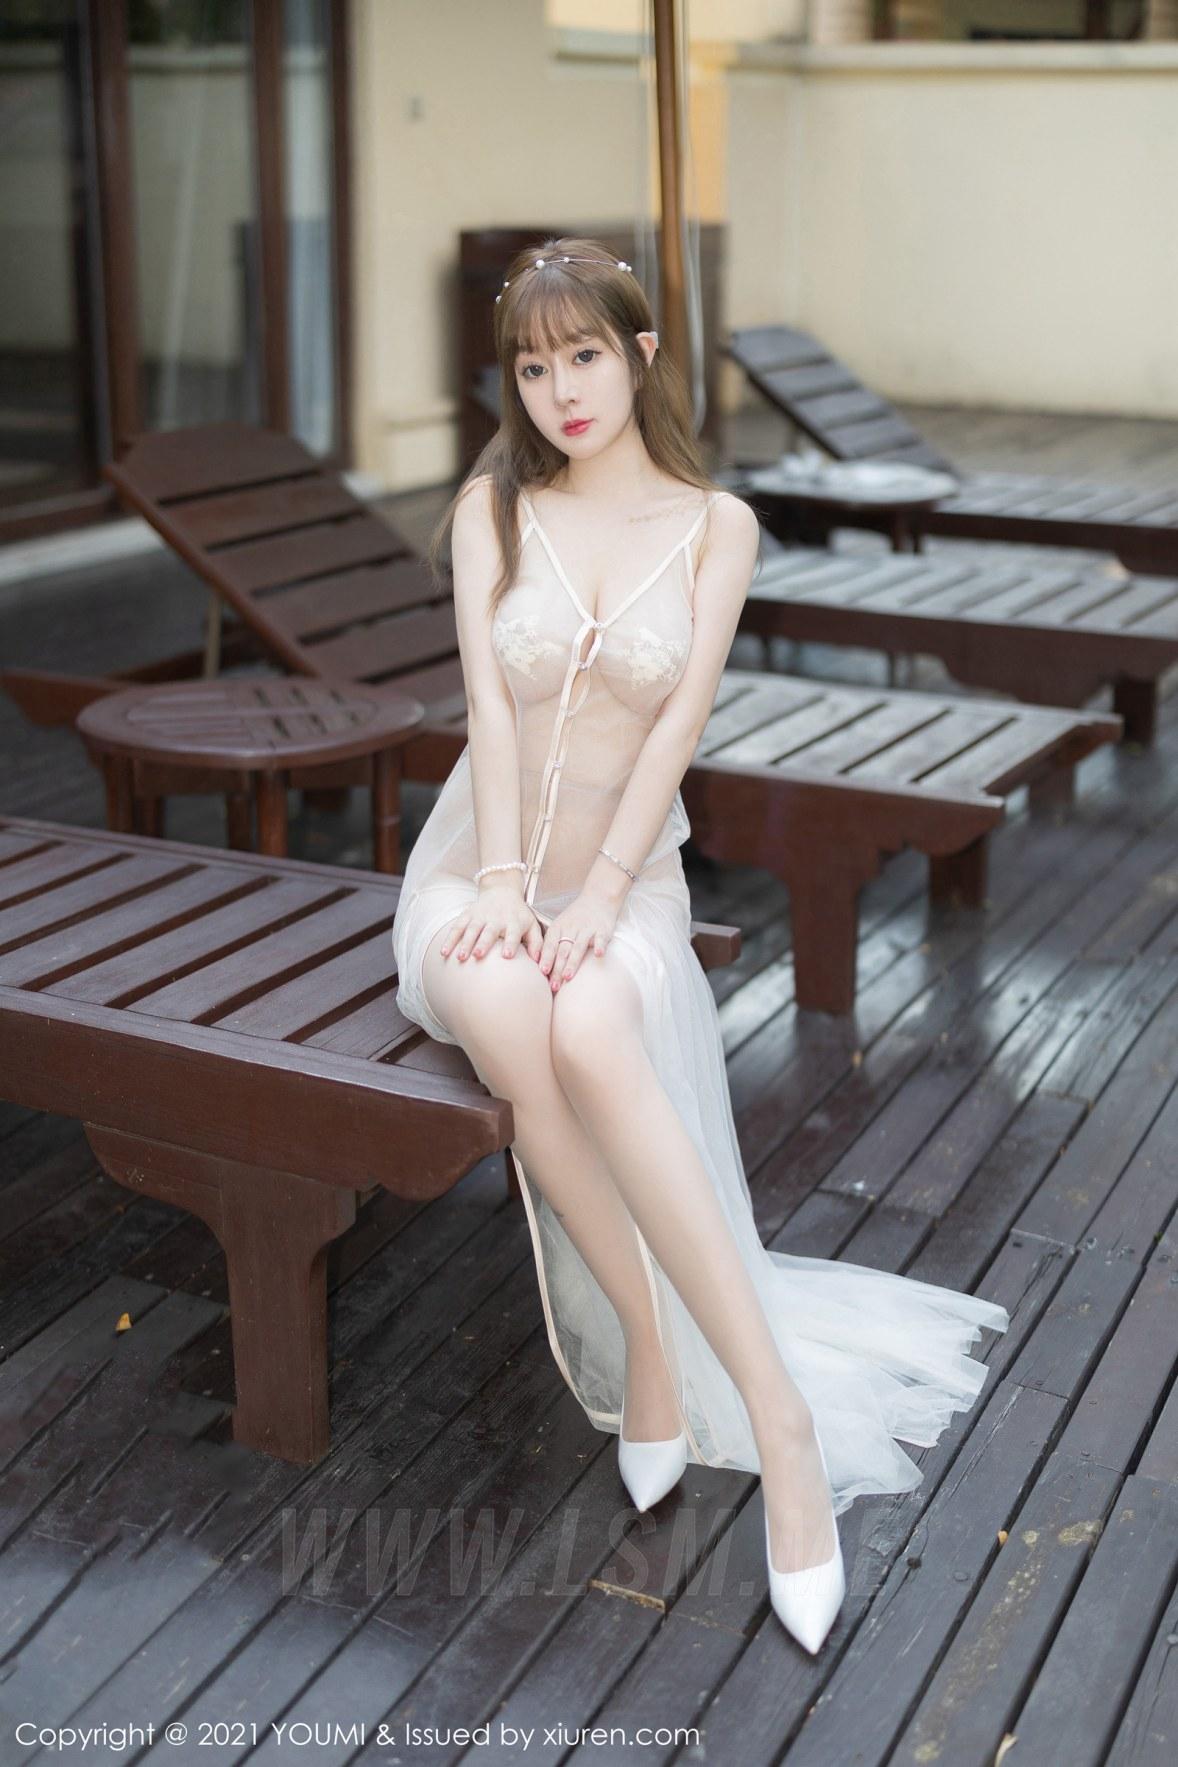 YOUMI 尤蜜荟 Vol.672 轻薄透服饰 王雨纯 西双版纳旅拍2 - 2